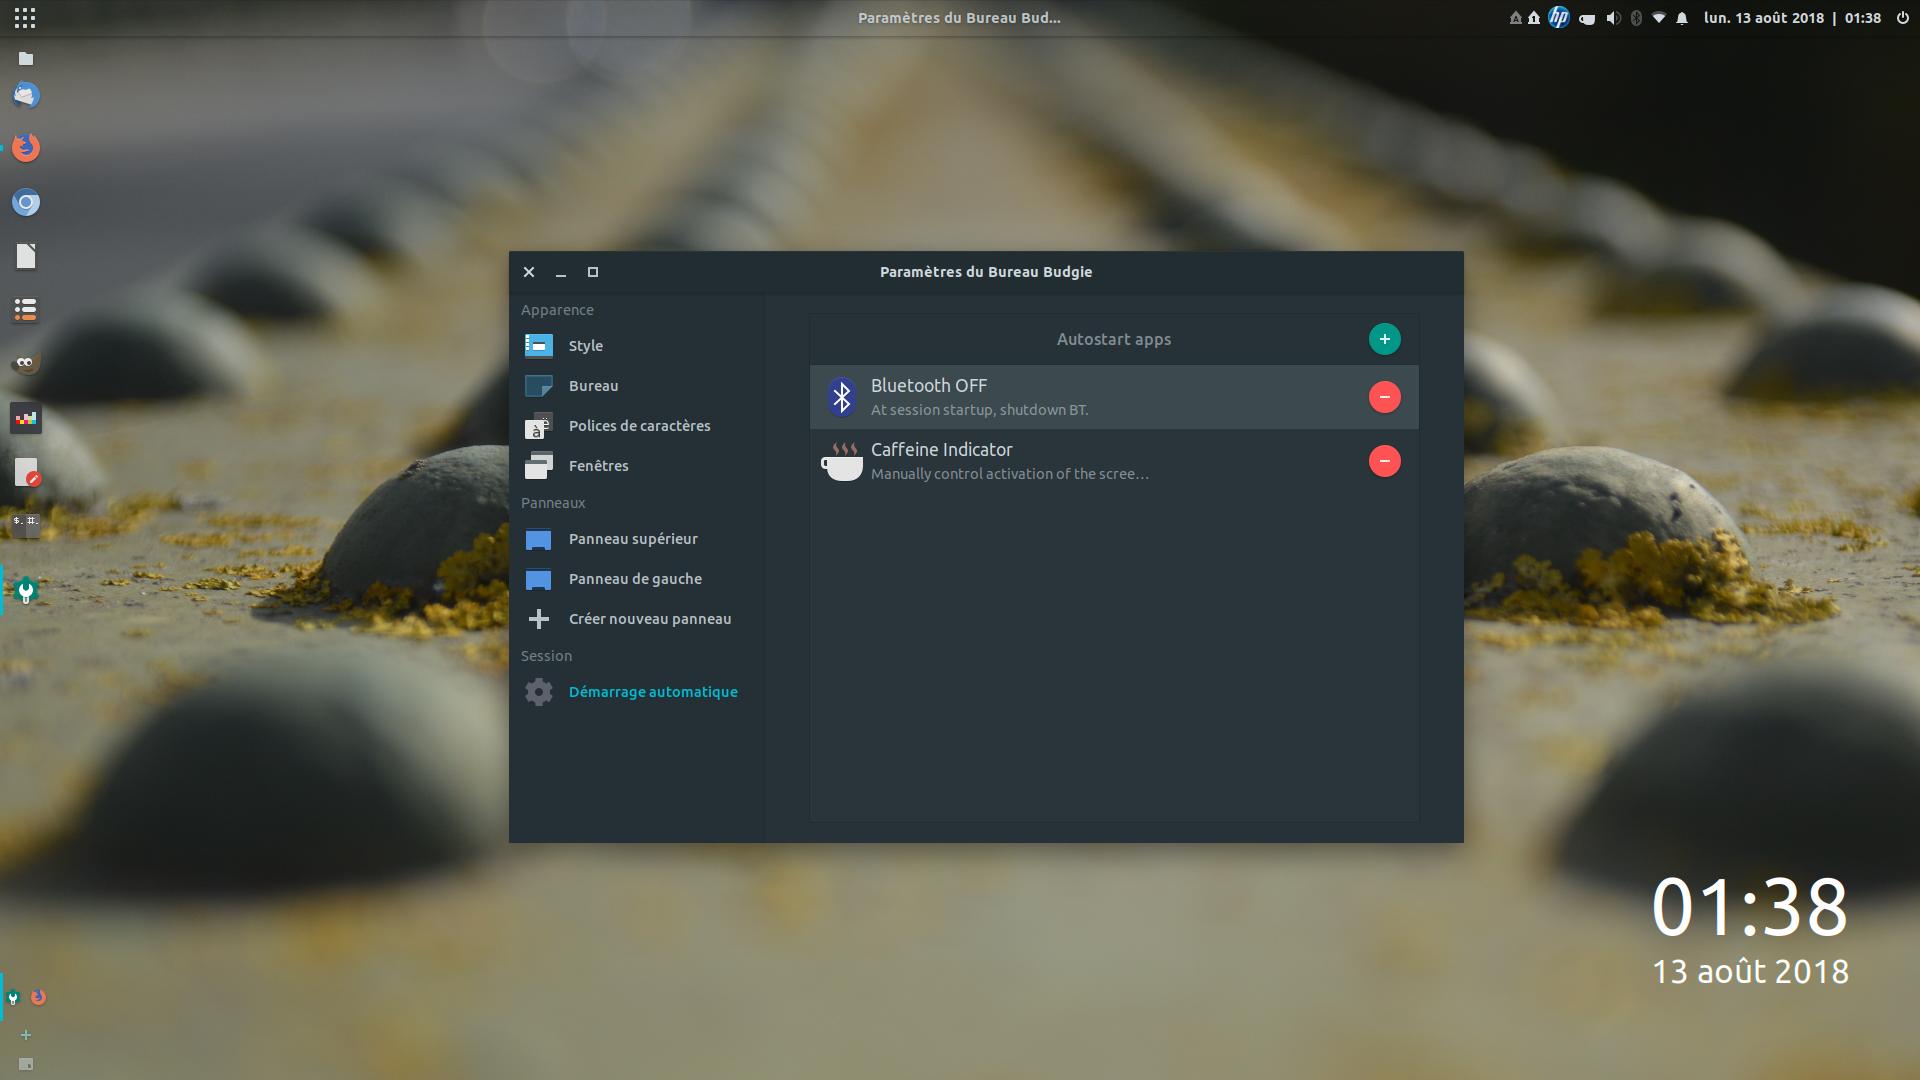 Bureau Noir Ubuntu : Arc welder faite tourner des applications android sur ubuntu